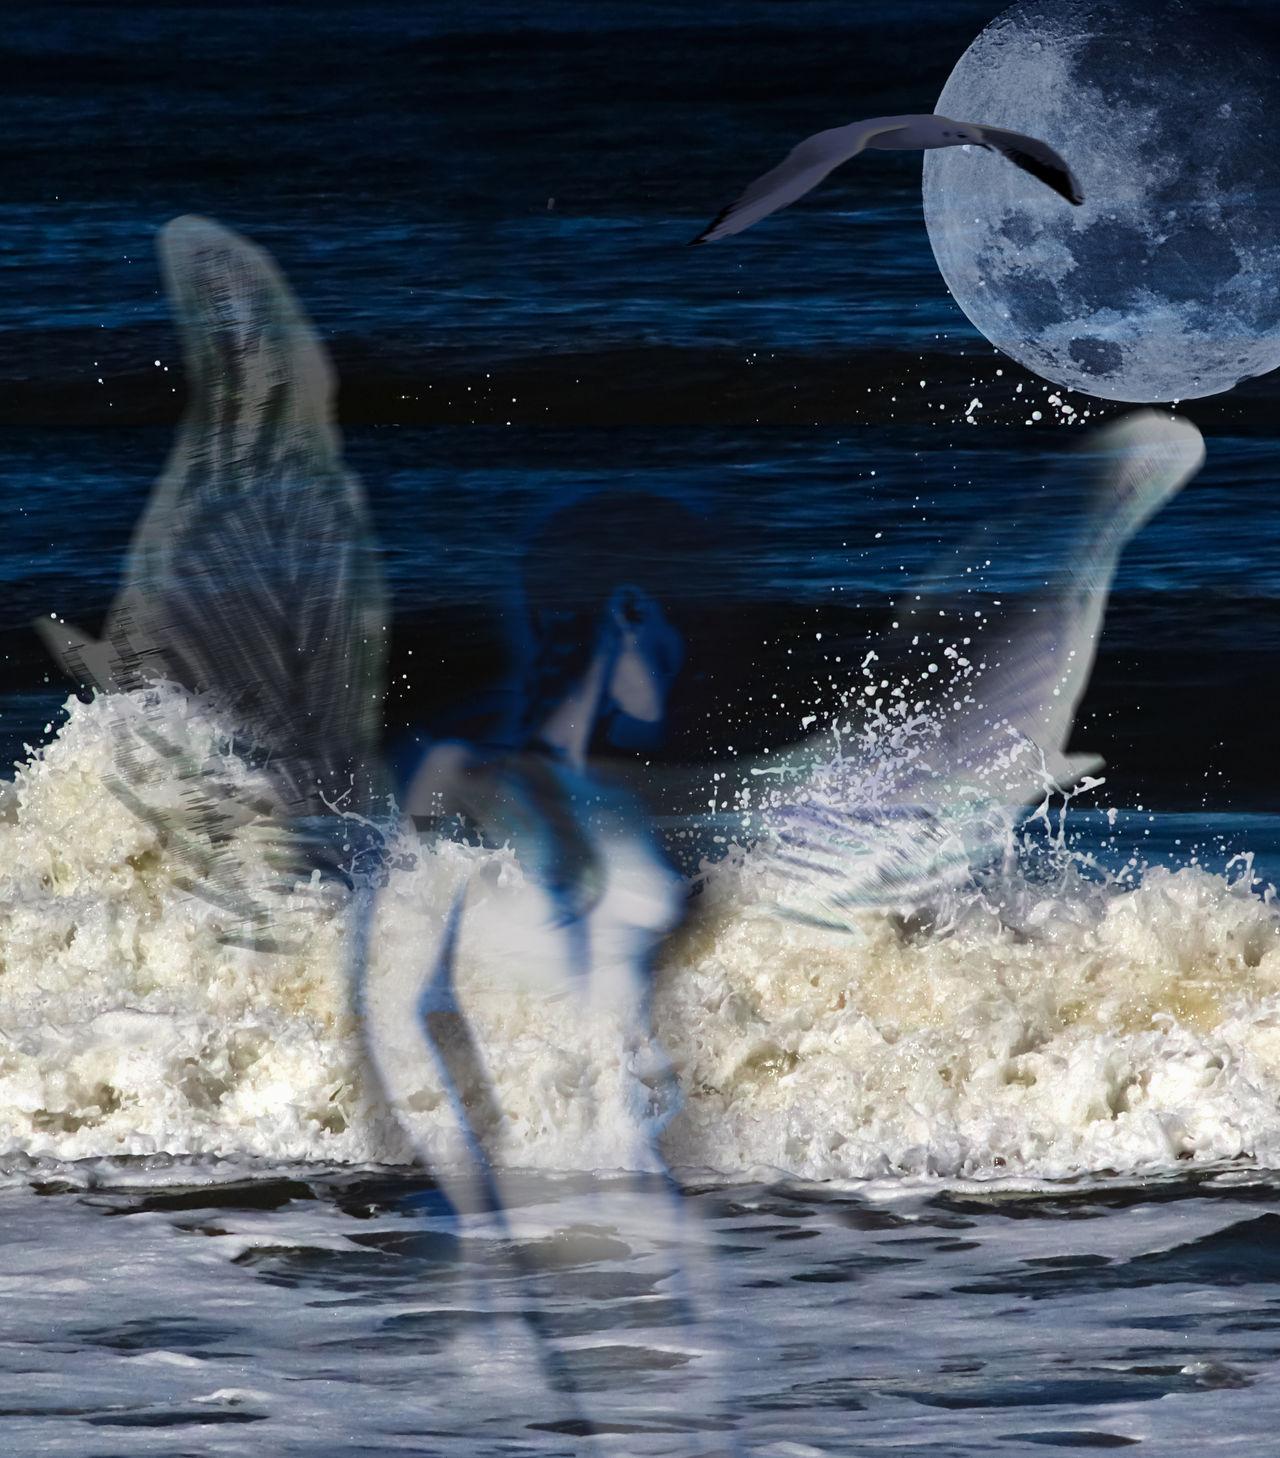 Angel Angel Bathing Angel Wings Digital Art Moon Moonlight Motion Sea Splashing Water Wave